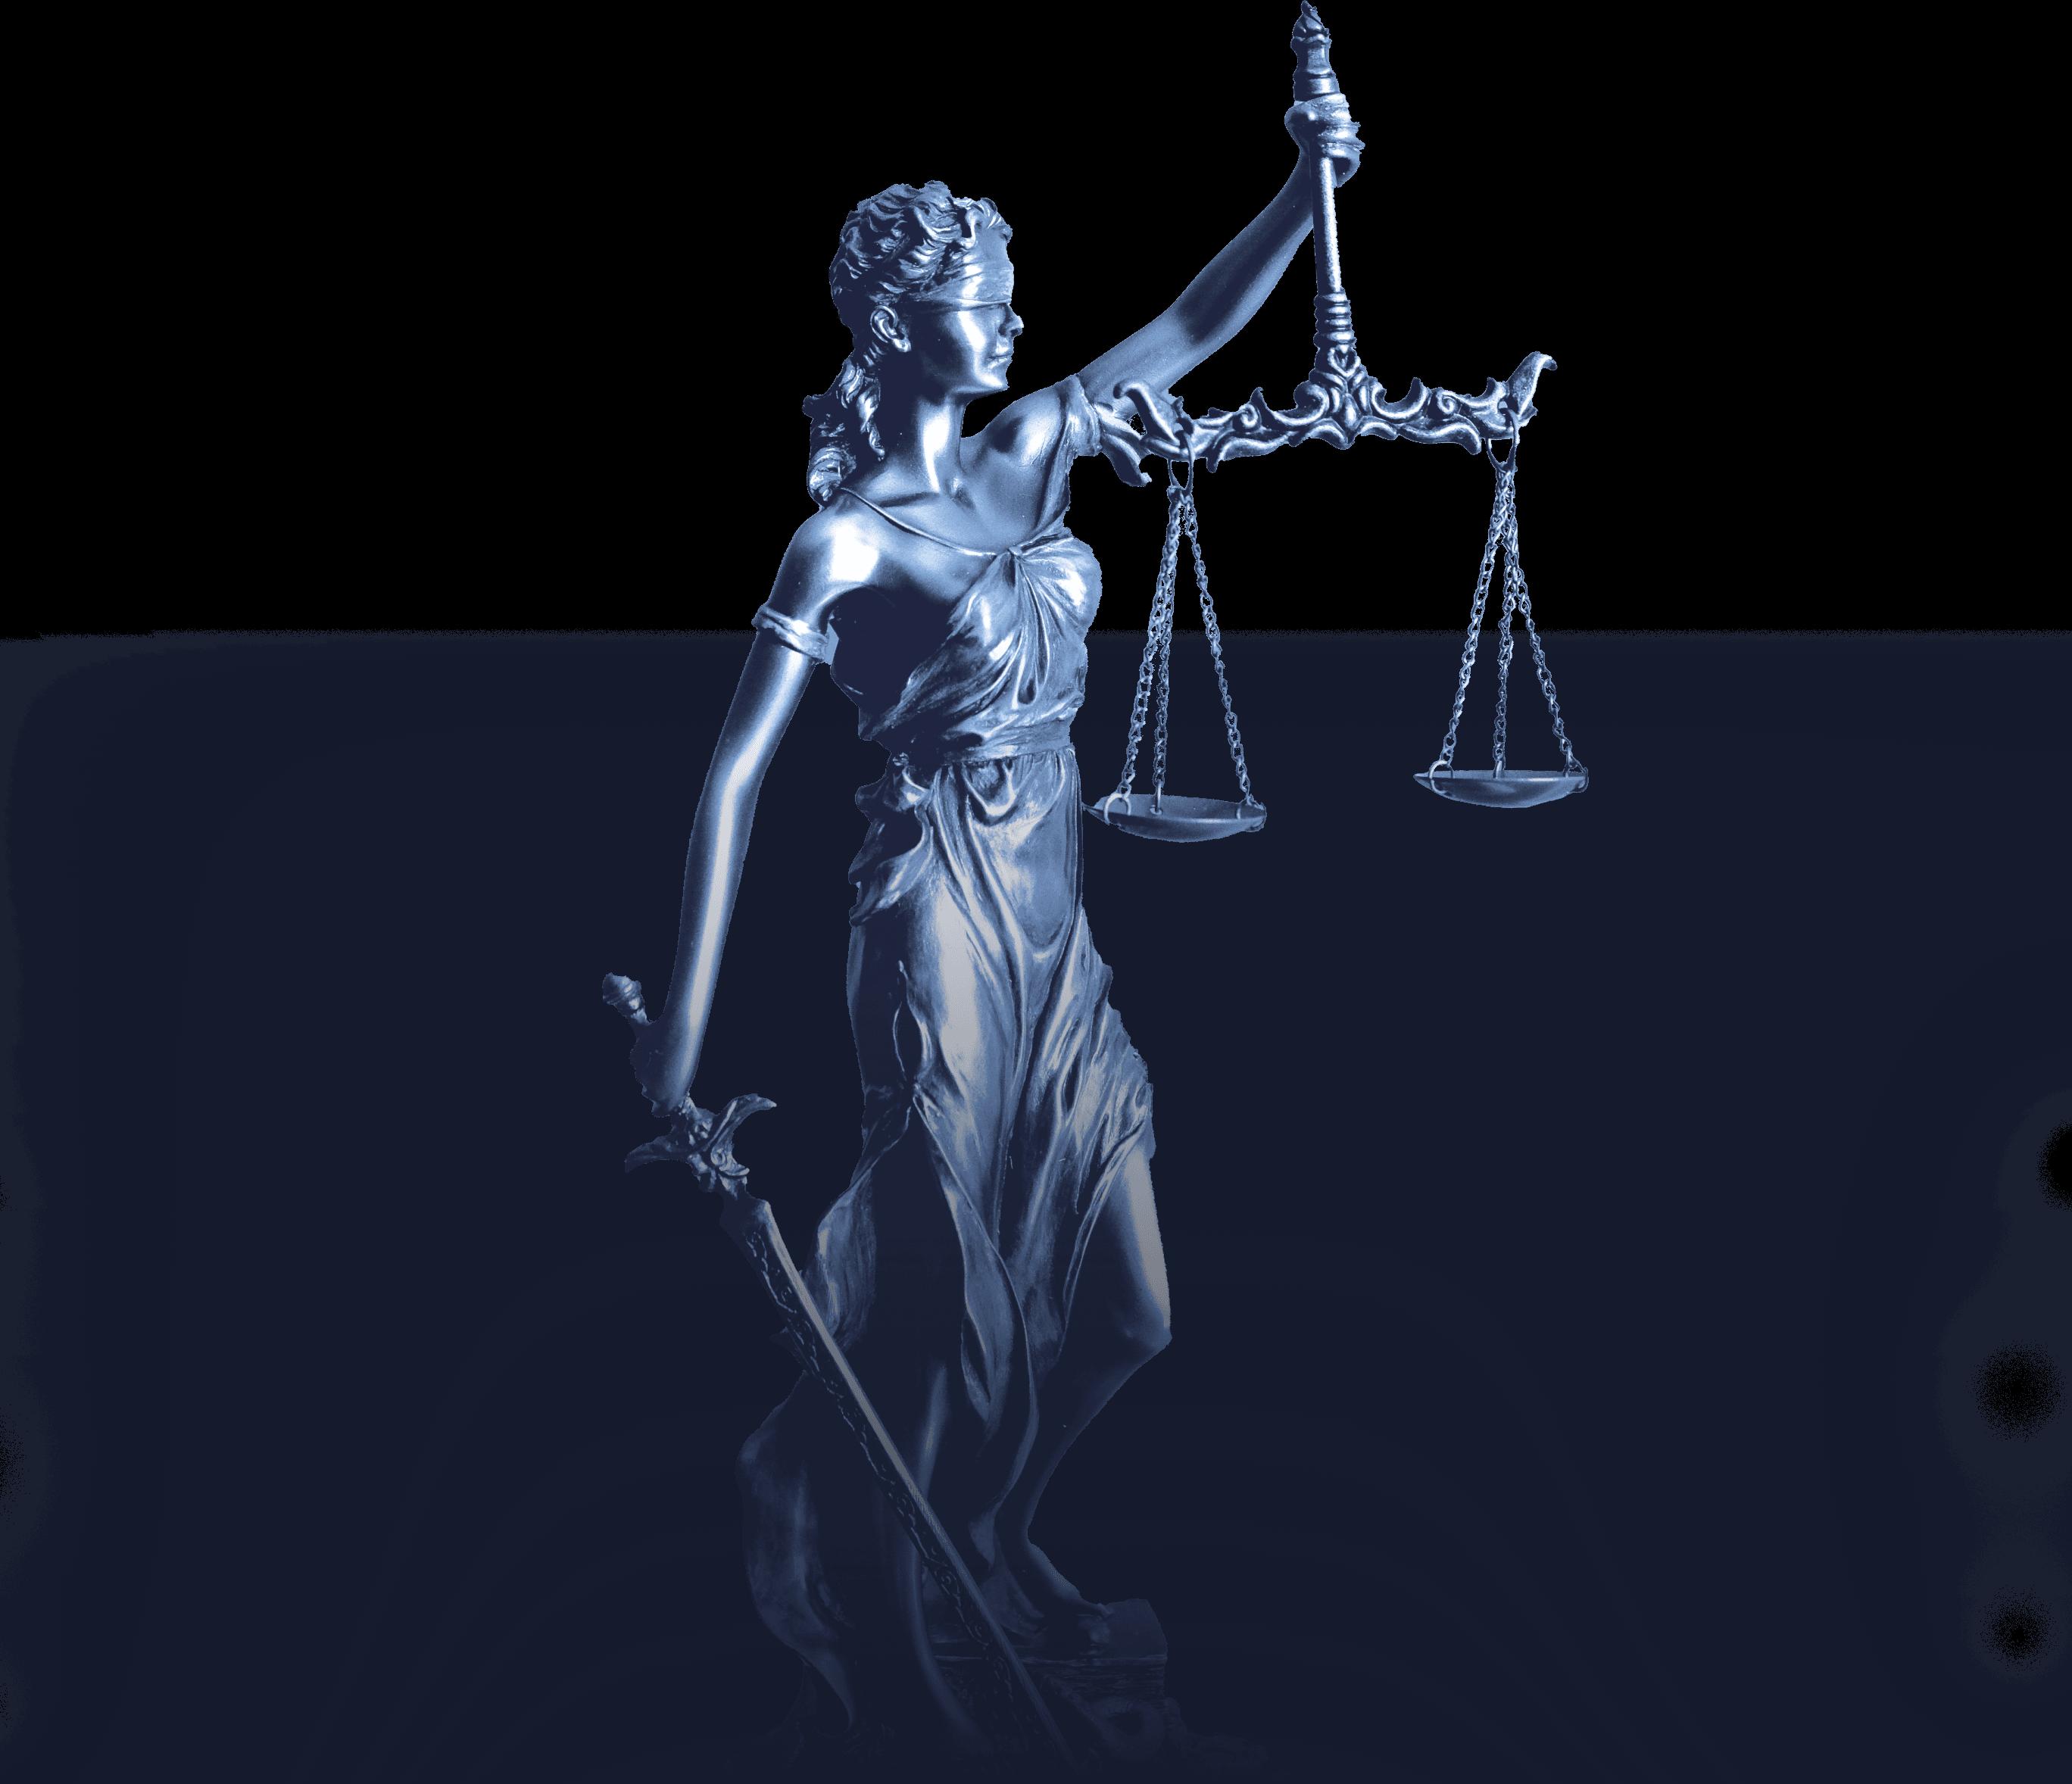 justice ilustration